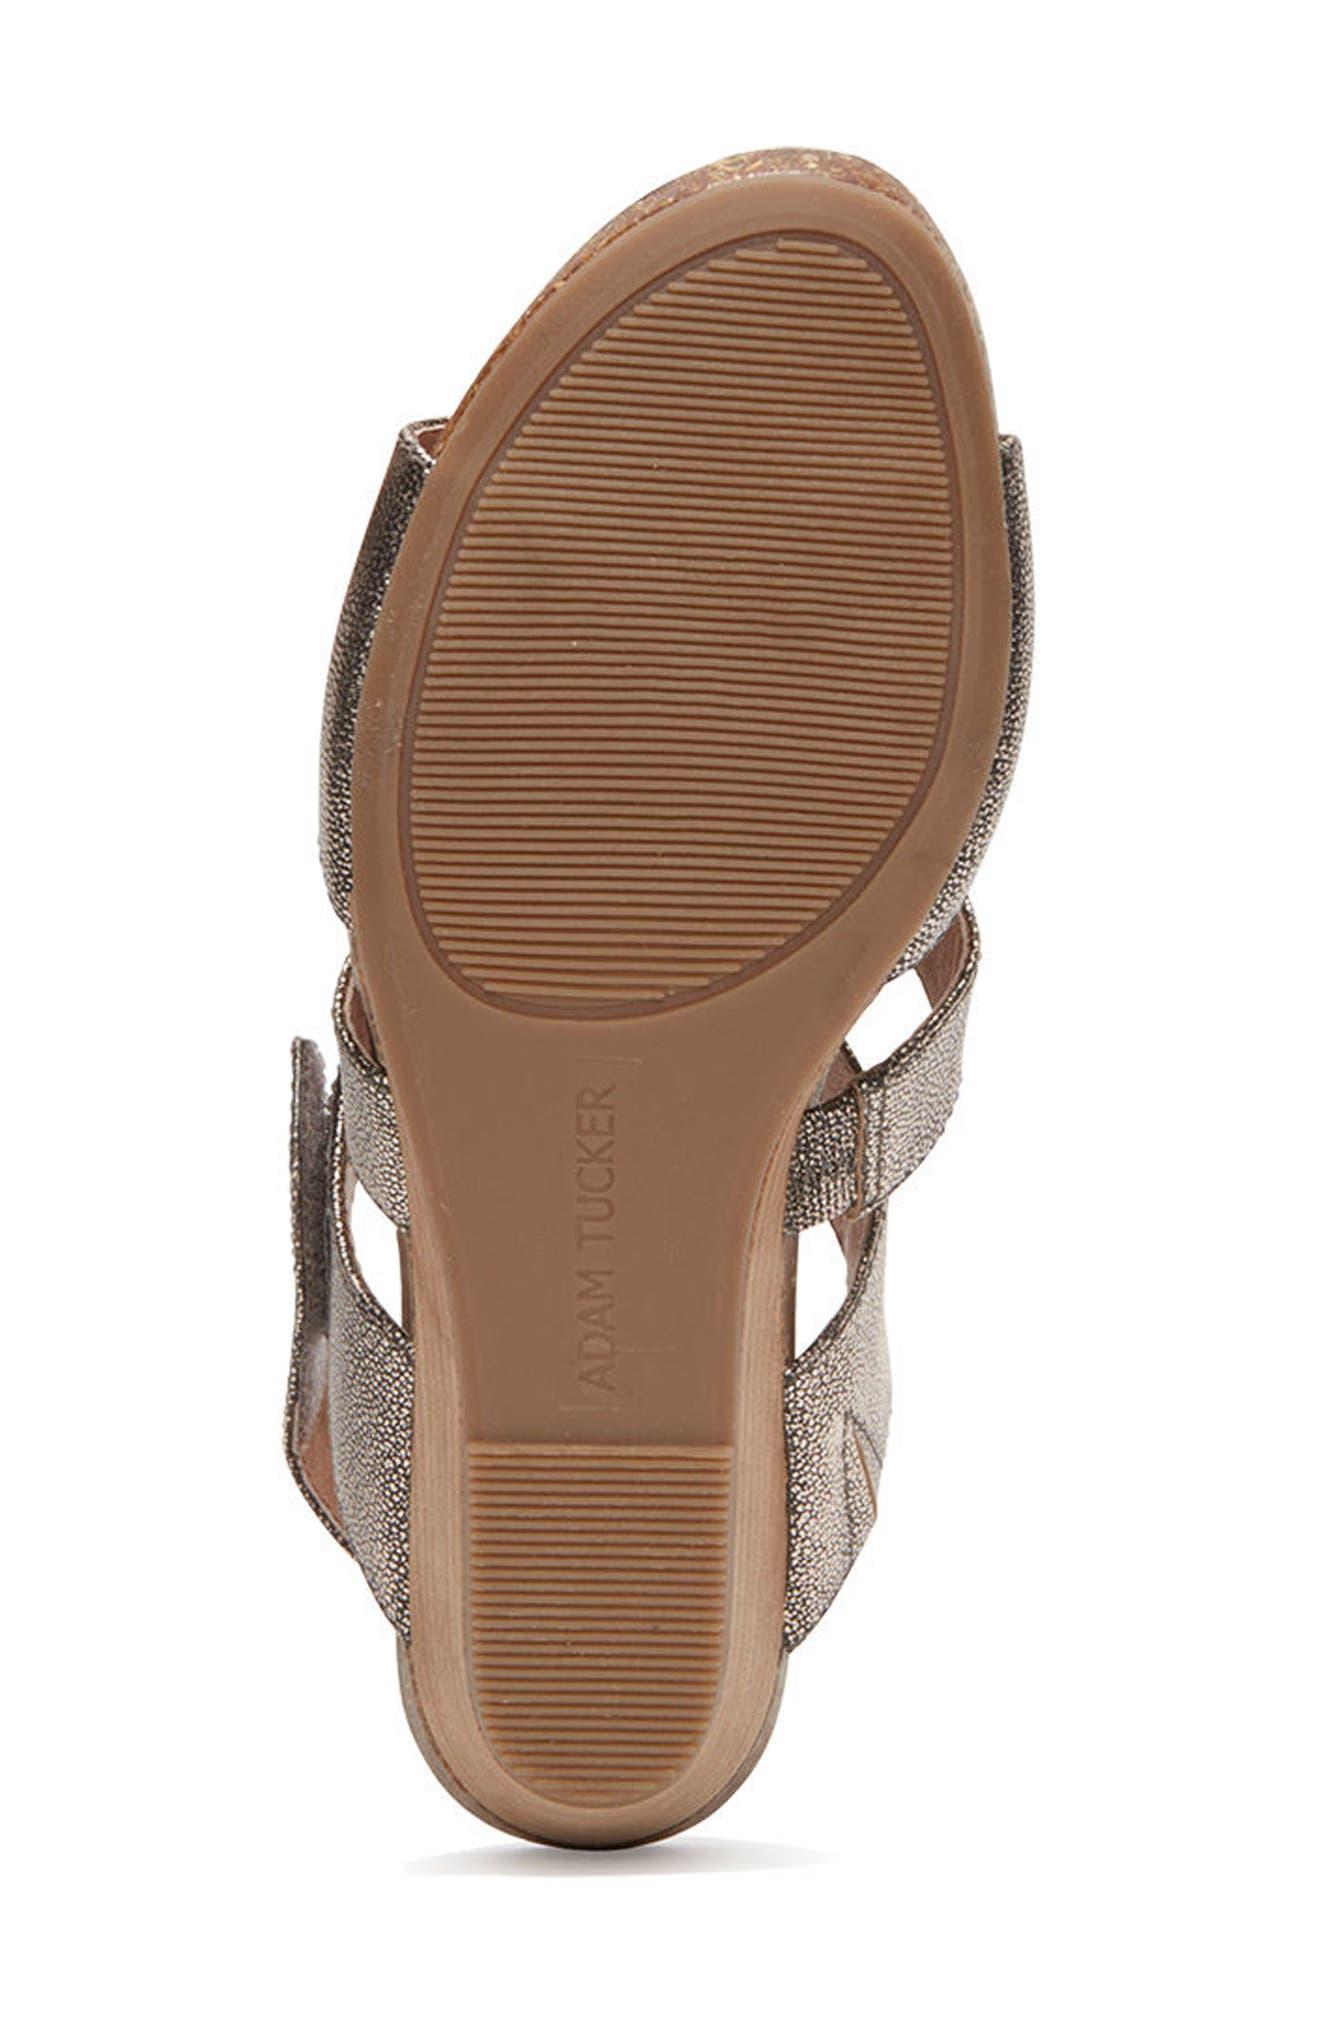 Adam Tucker Tora Wedge Sandal,                             Alternate thumbnail 5, color,                             Champagne Leather